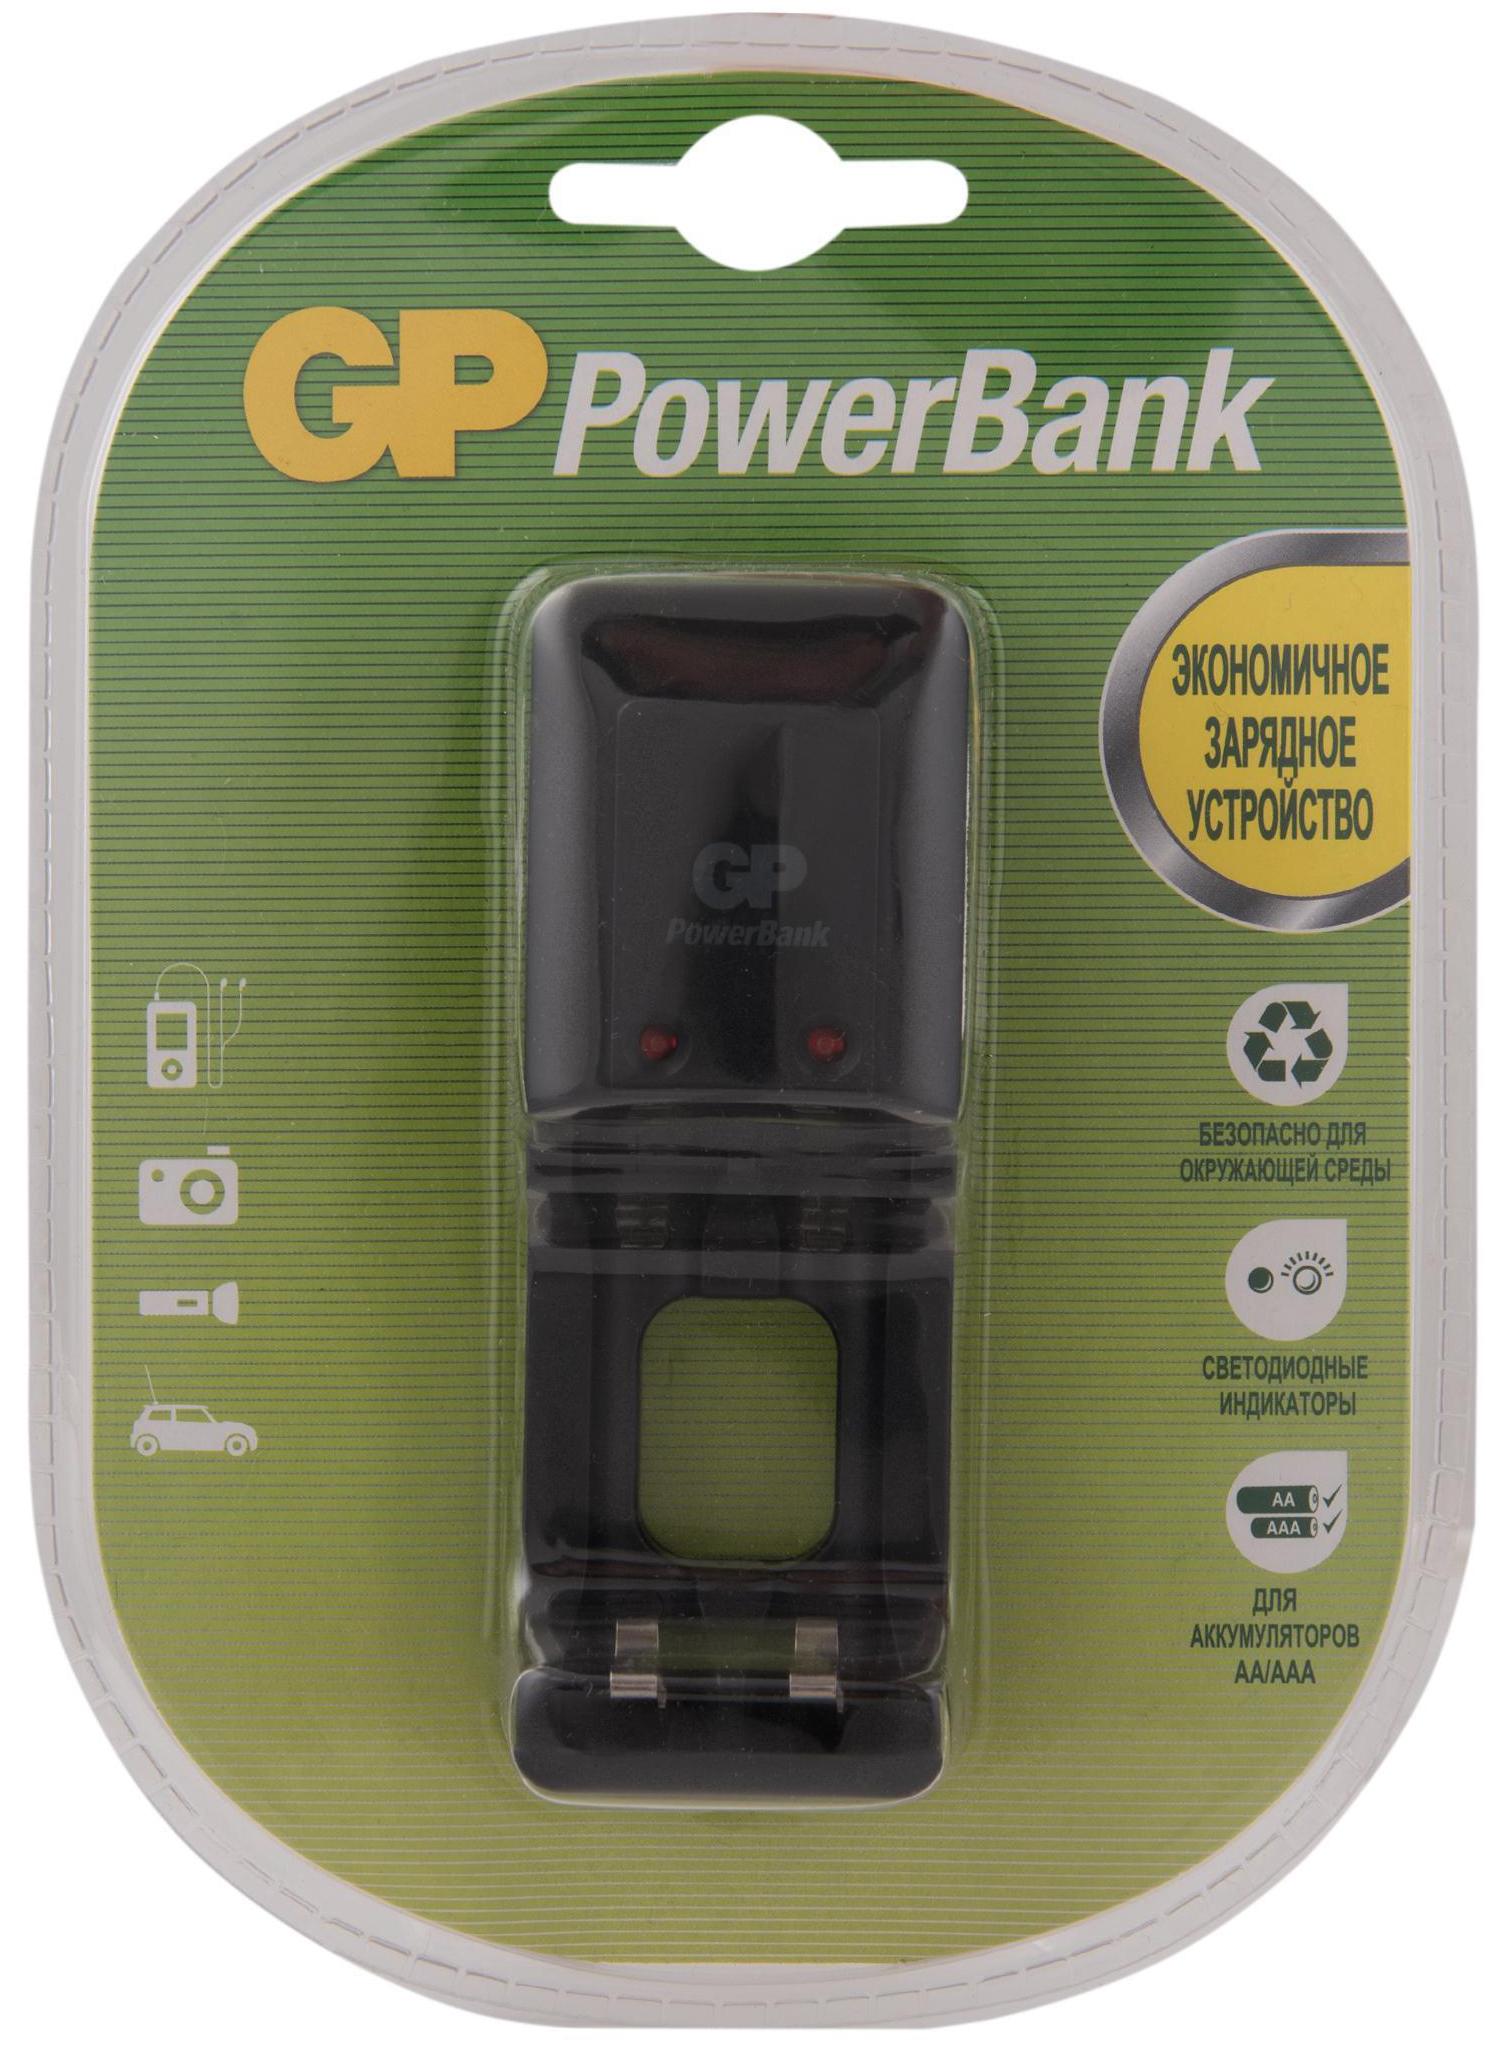 Стандартная зарядка PB330 для АА и ААА аккумуляторов в клемшеле